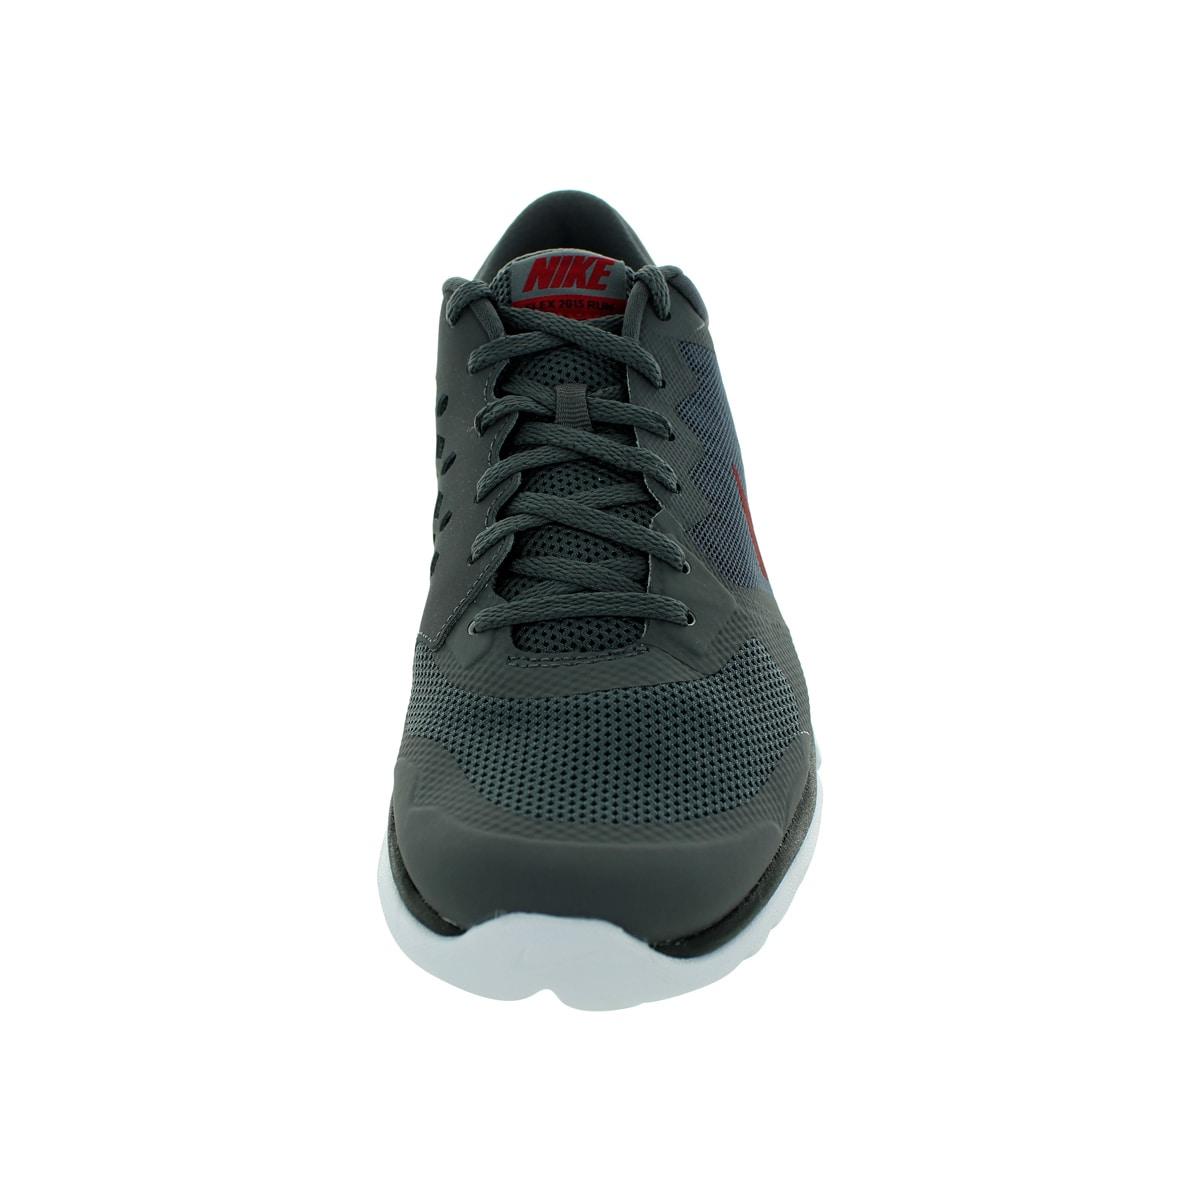 82d086047bb5 Shop Nike Men s Flex 2015 Dark Grey Gym Red Black White Running Shoe - Free  Shipping Today - Overstock - 12328913